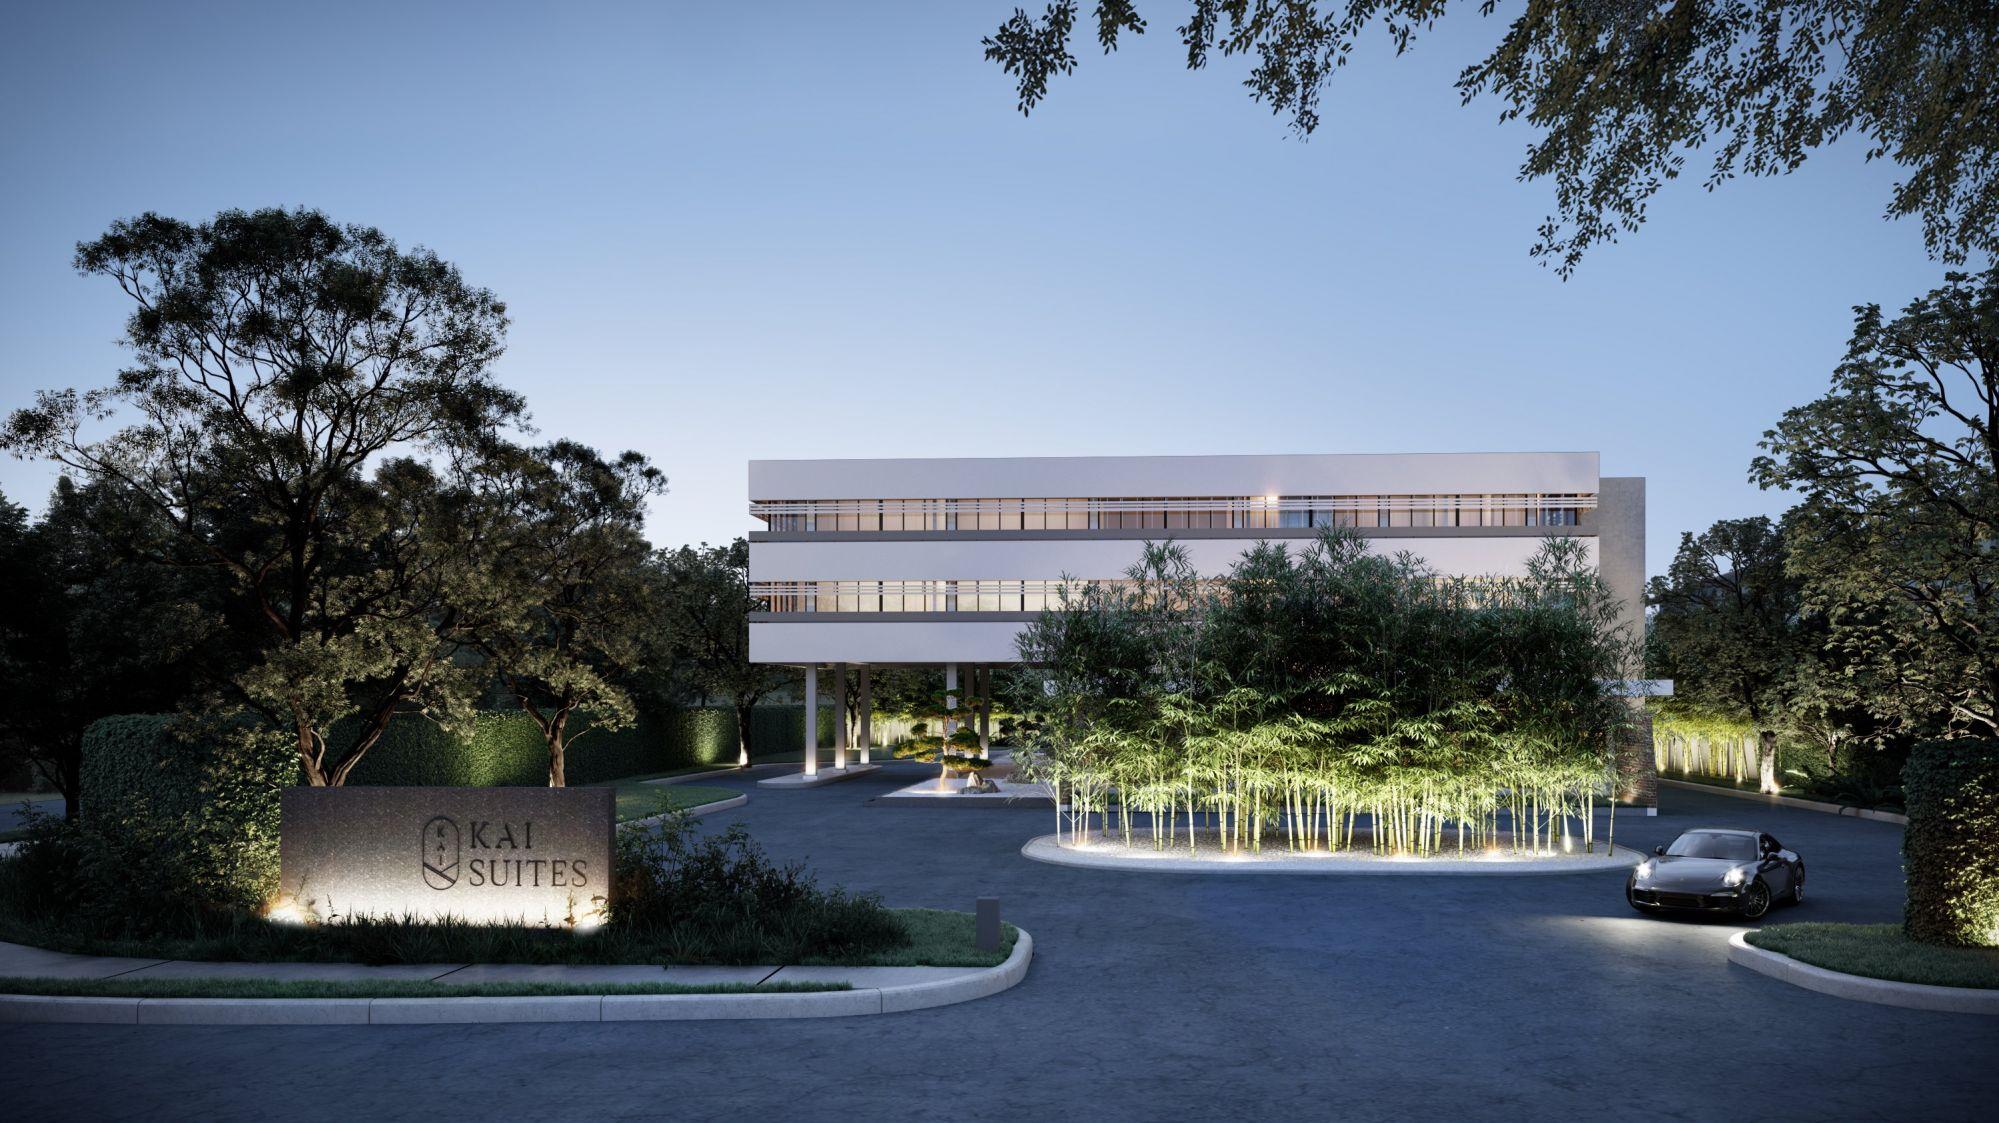 Kai Suites in Singapore: K2LD Architects on the Luxury Confinement Centre's Design Elements